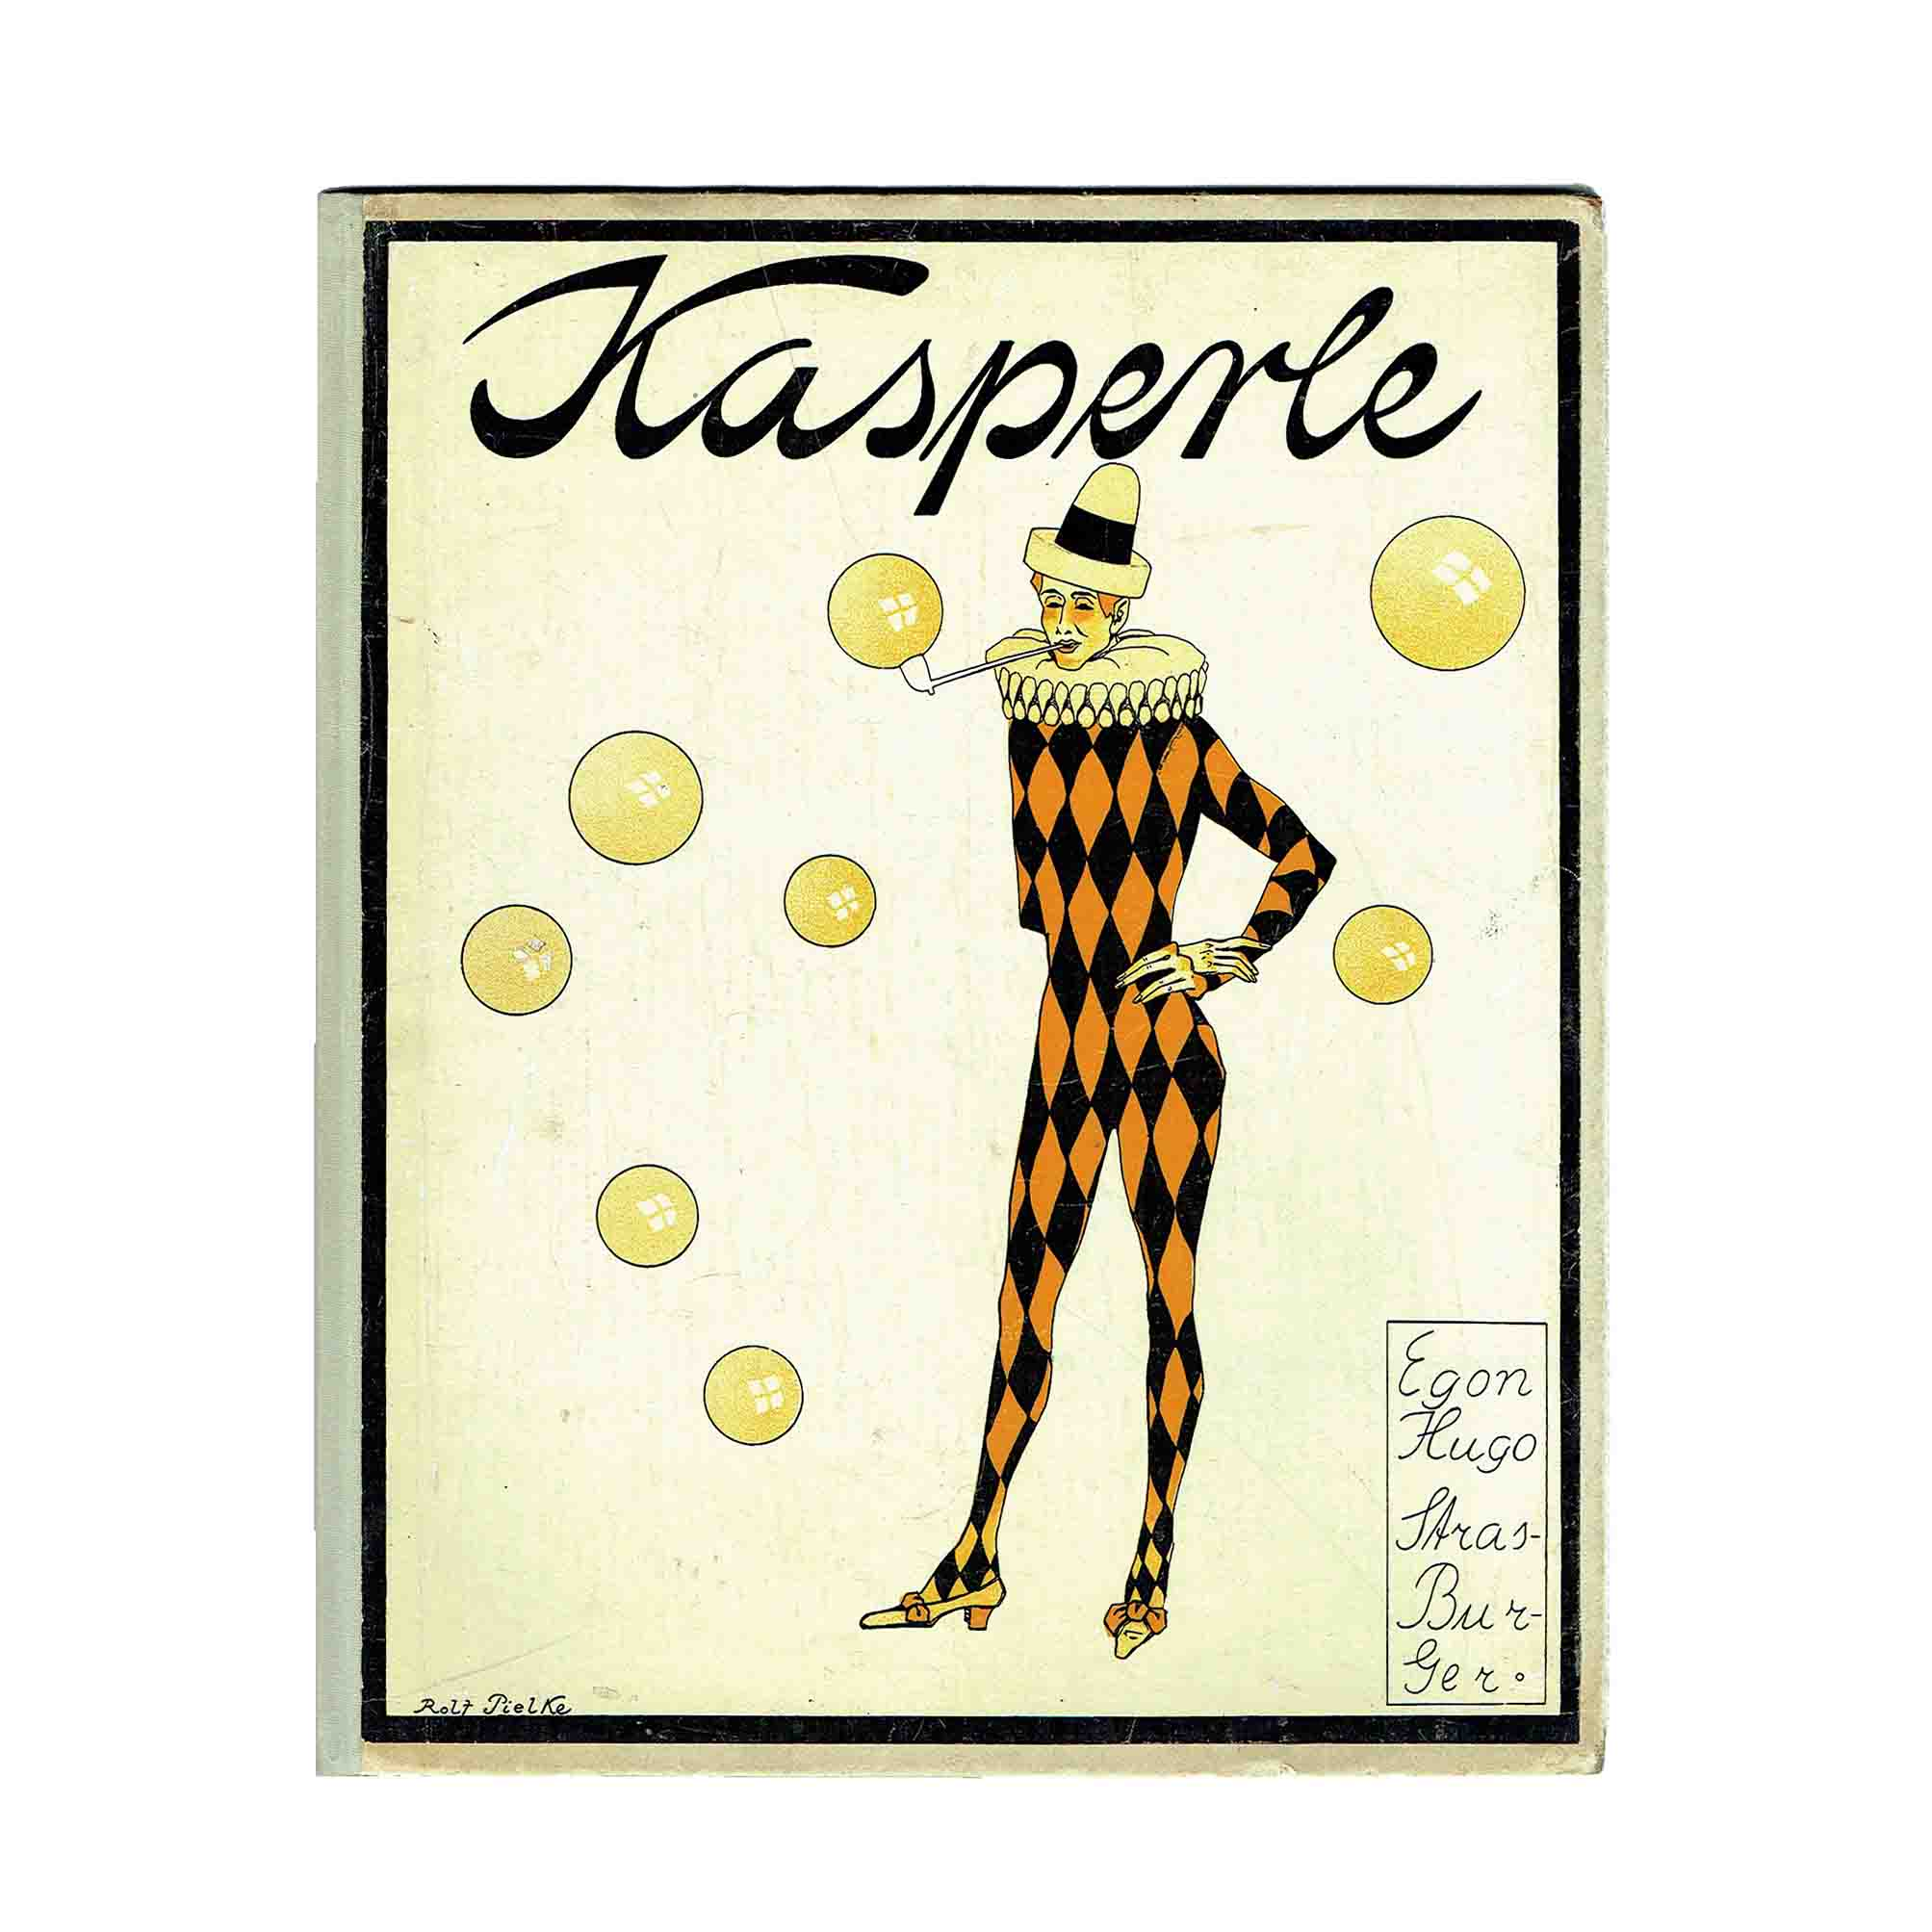 6018 Strasburger Pielke Kasperle 1912 Einband frei A N